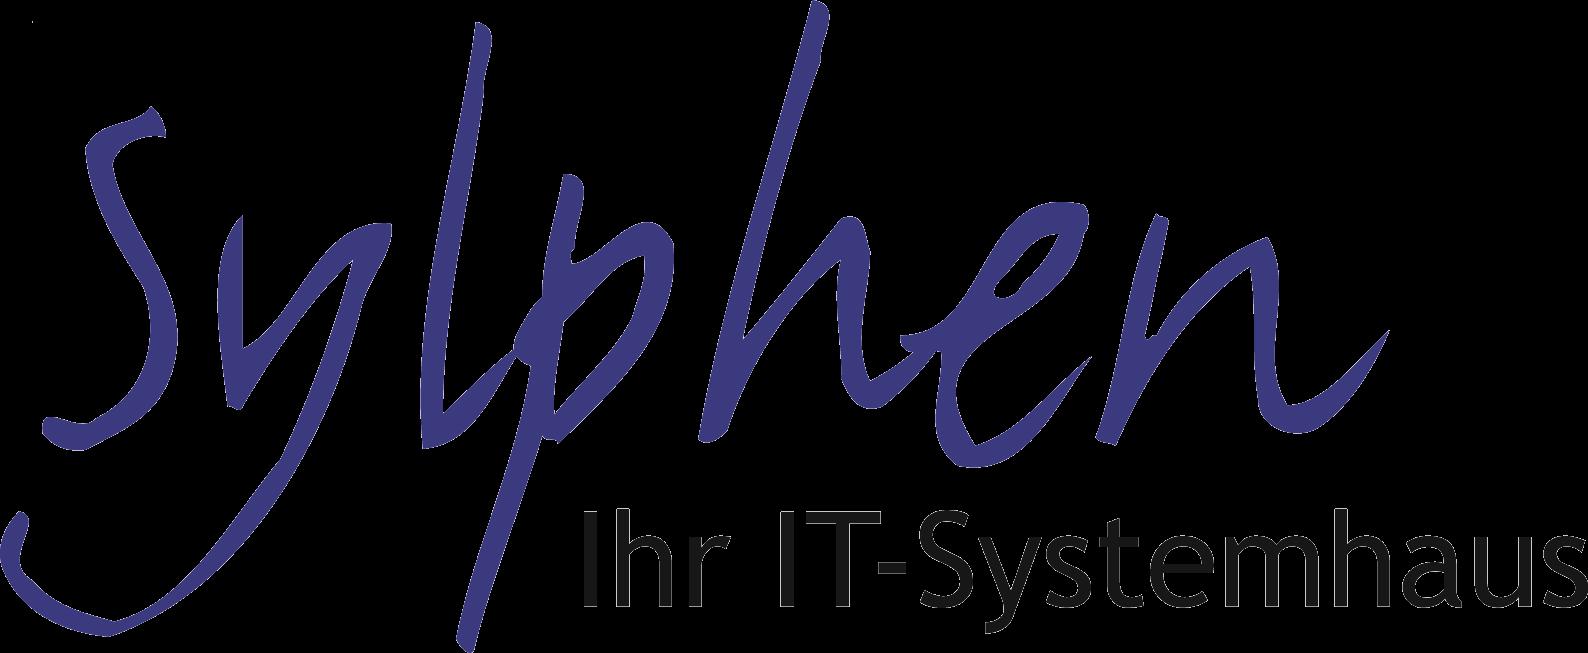 Sylphen IT-Systemhaus